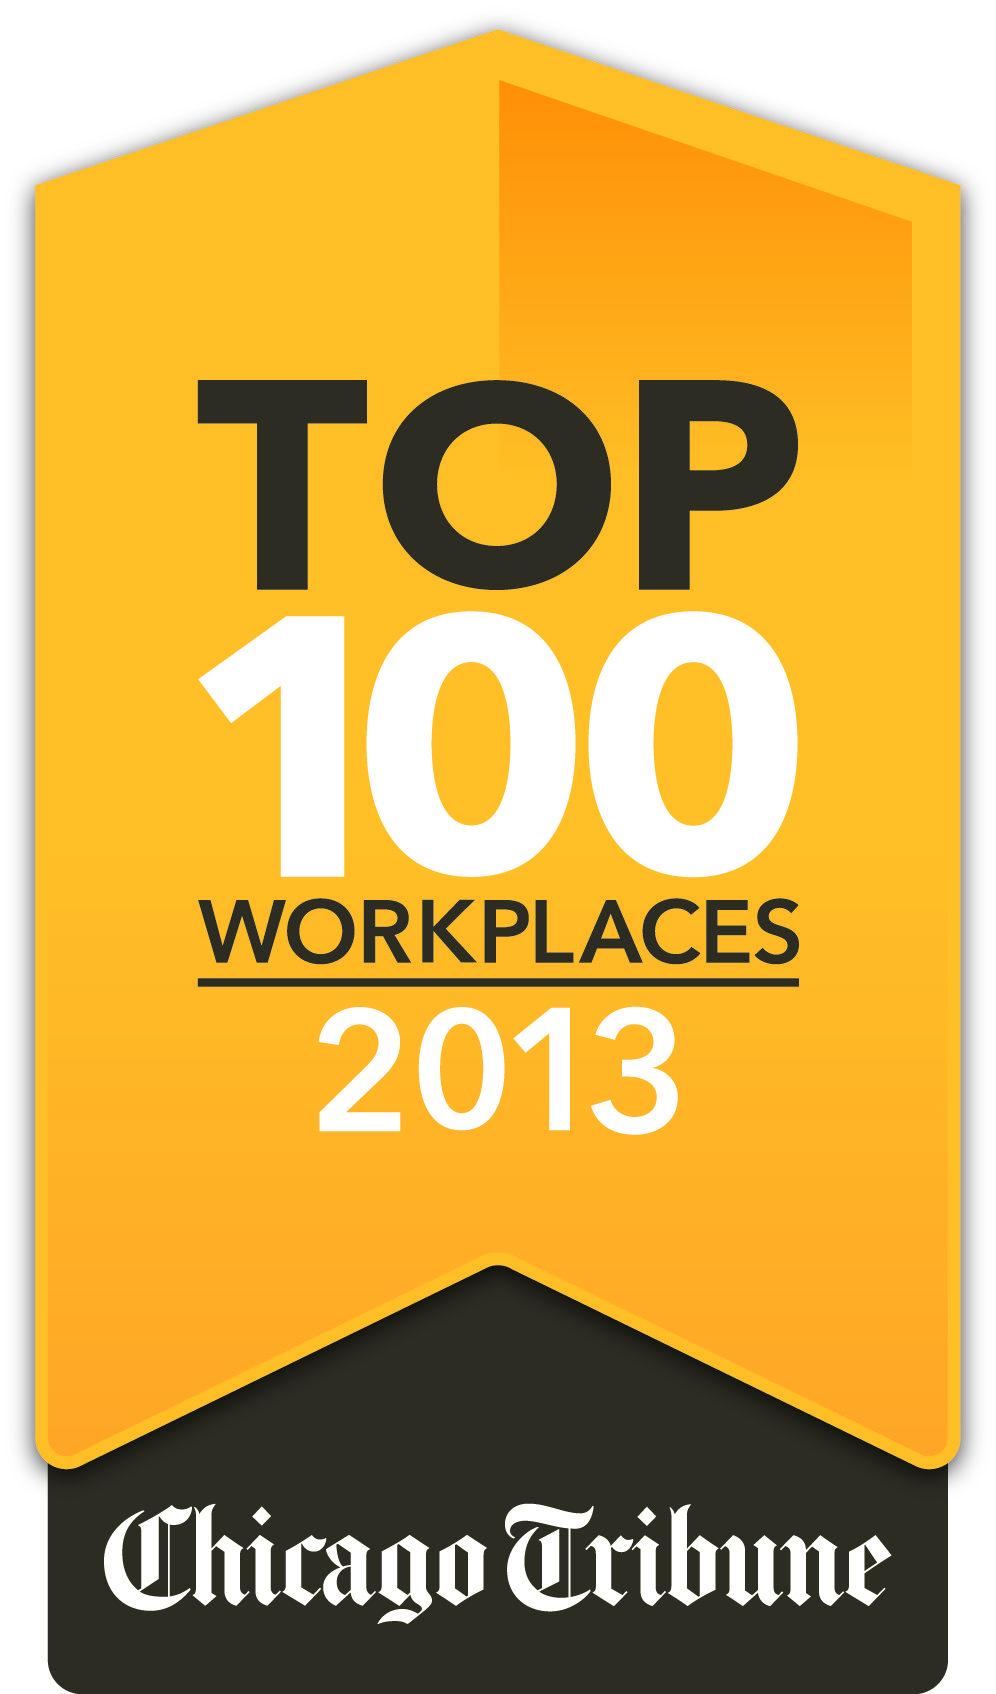 Chicago Tribune's Top 100 Workplaces 2013 winner